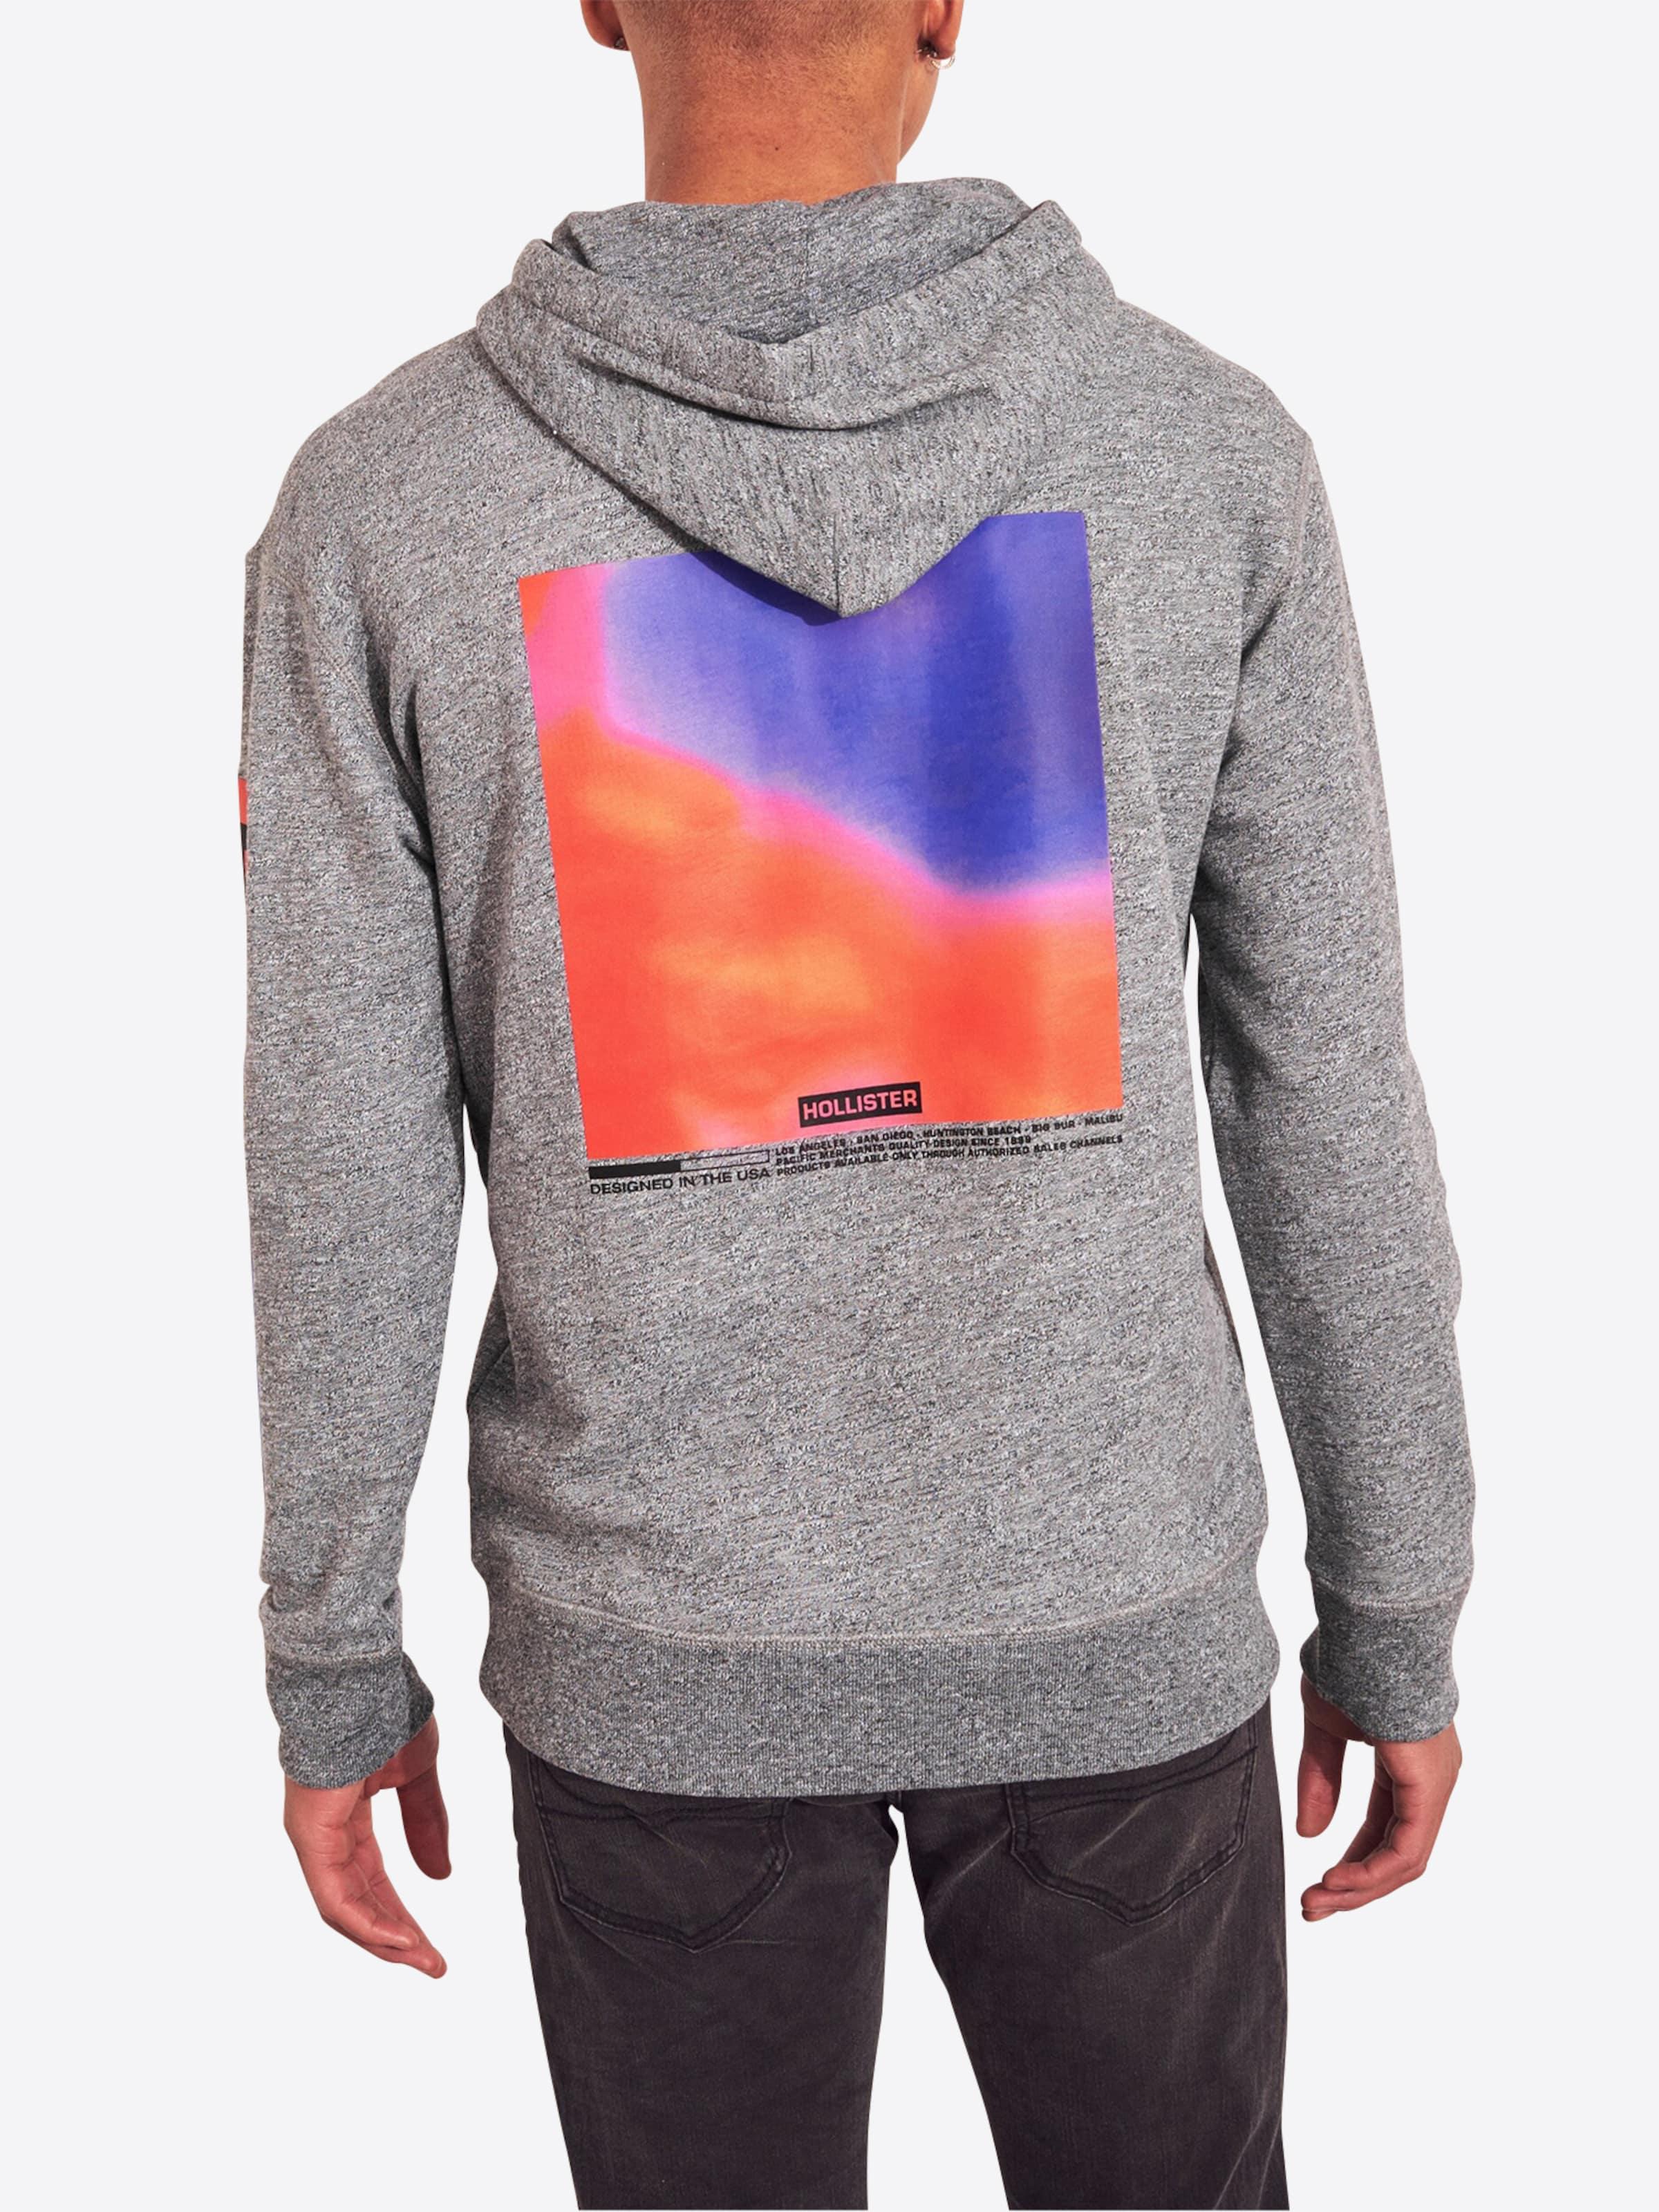 In Sweatshirt Hollister Sweatshirt Hollister Grau Hollister Grau In D2HEI9